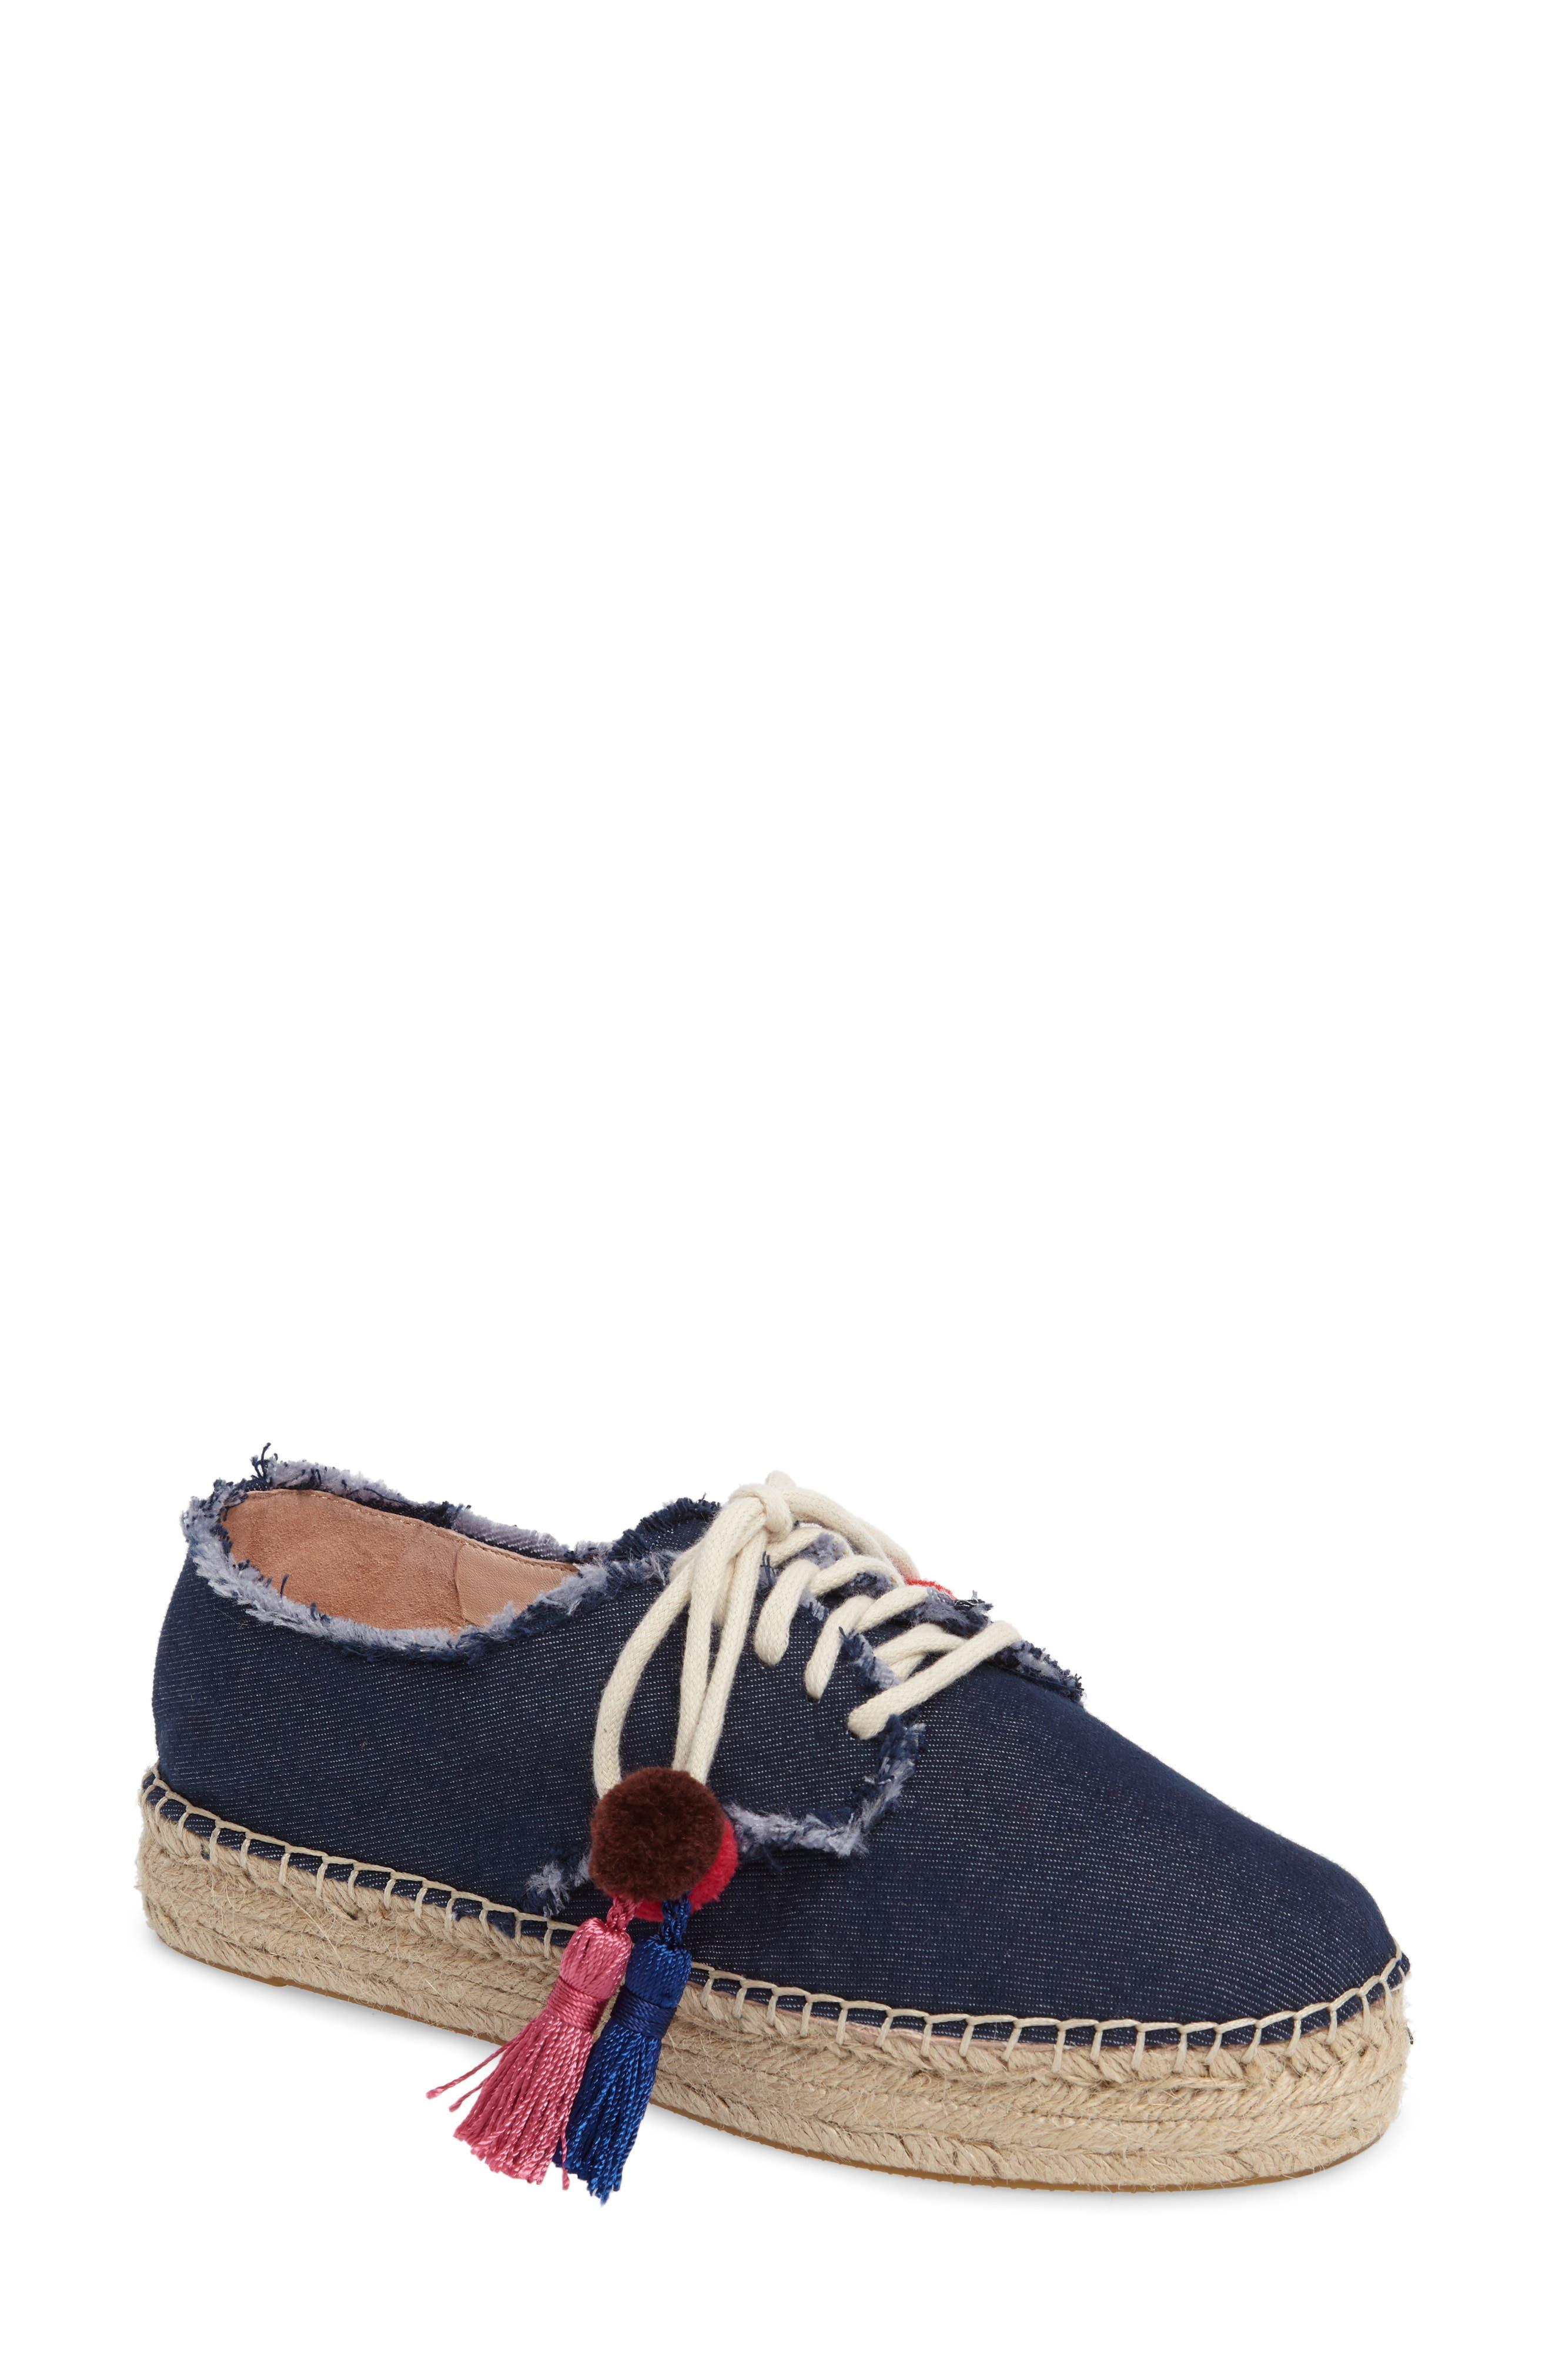 lane espadrille platform sneaker,                         Main,                         color, Blue Jeans